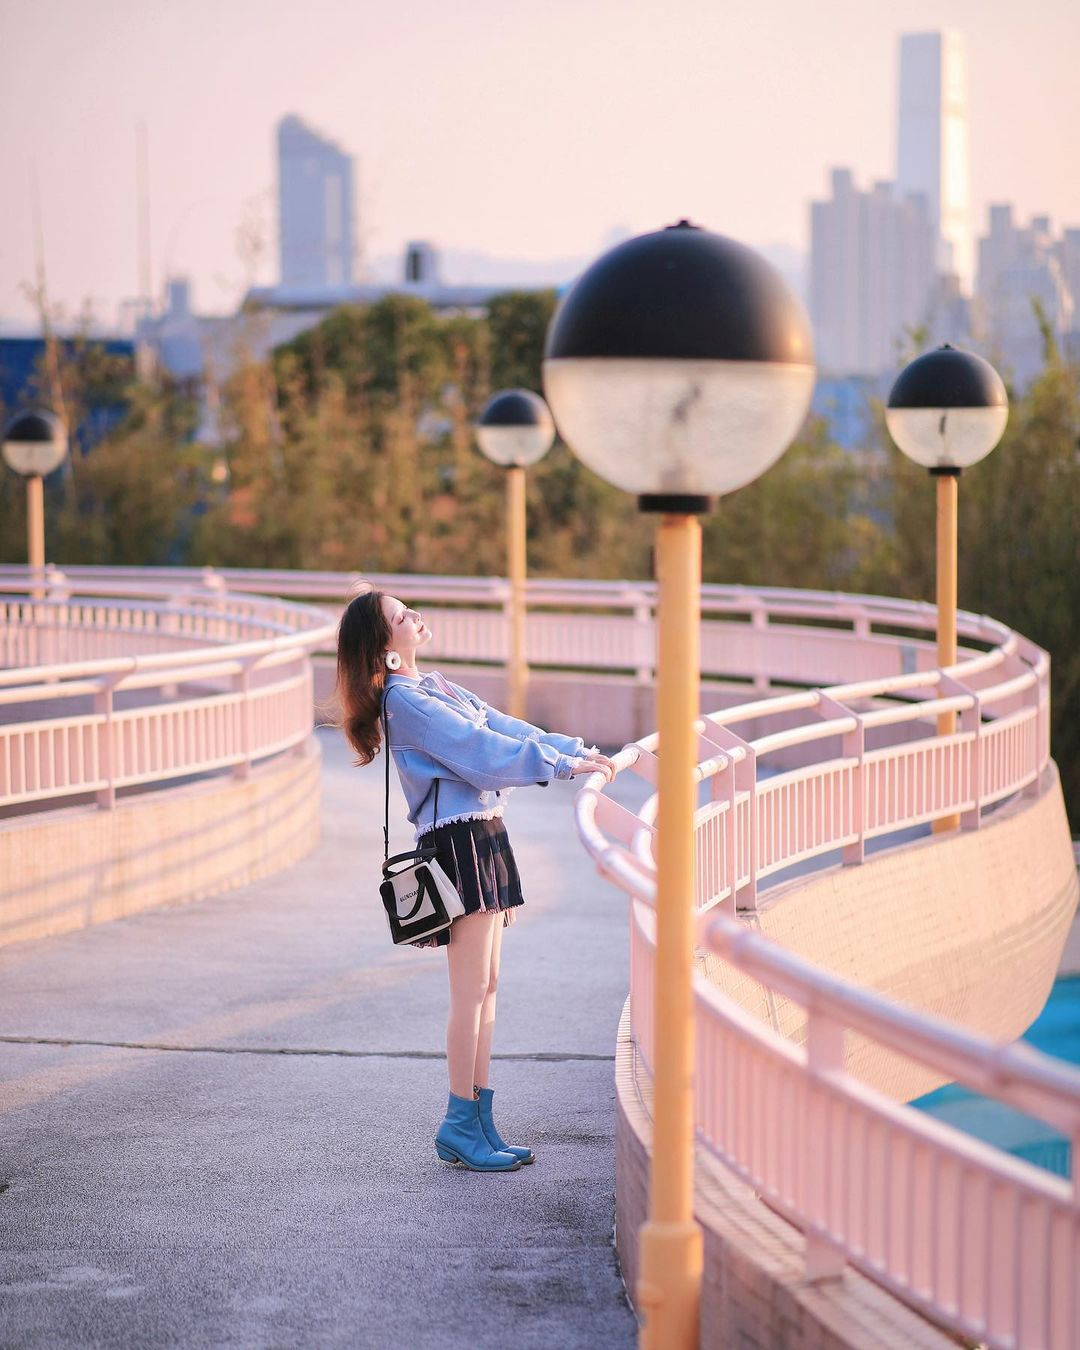 石硤尾公園粉紅色欄杆 (圖片來源:IG@yoli_chic_chic)